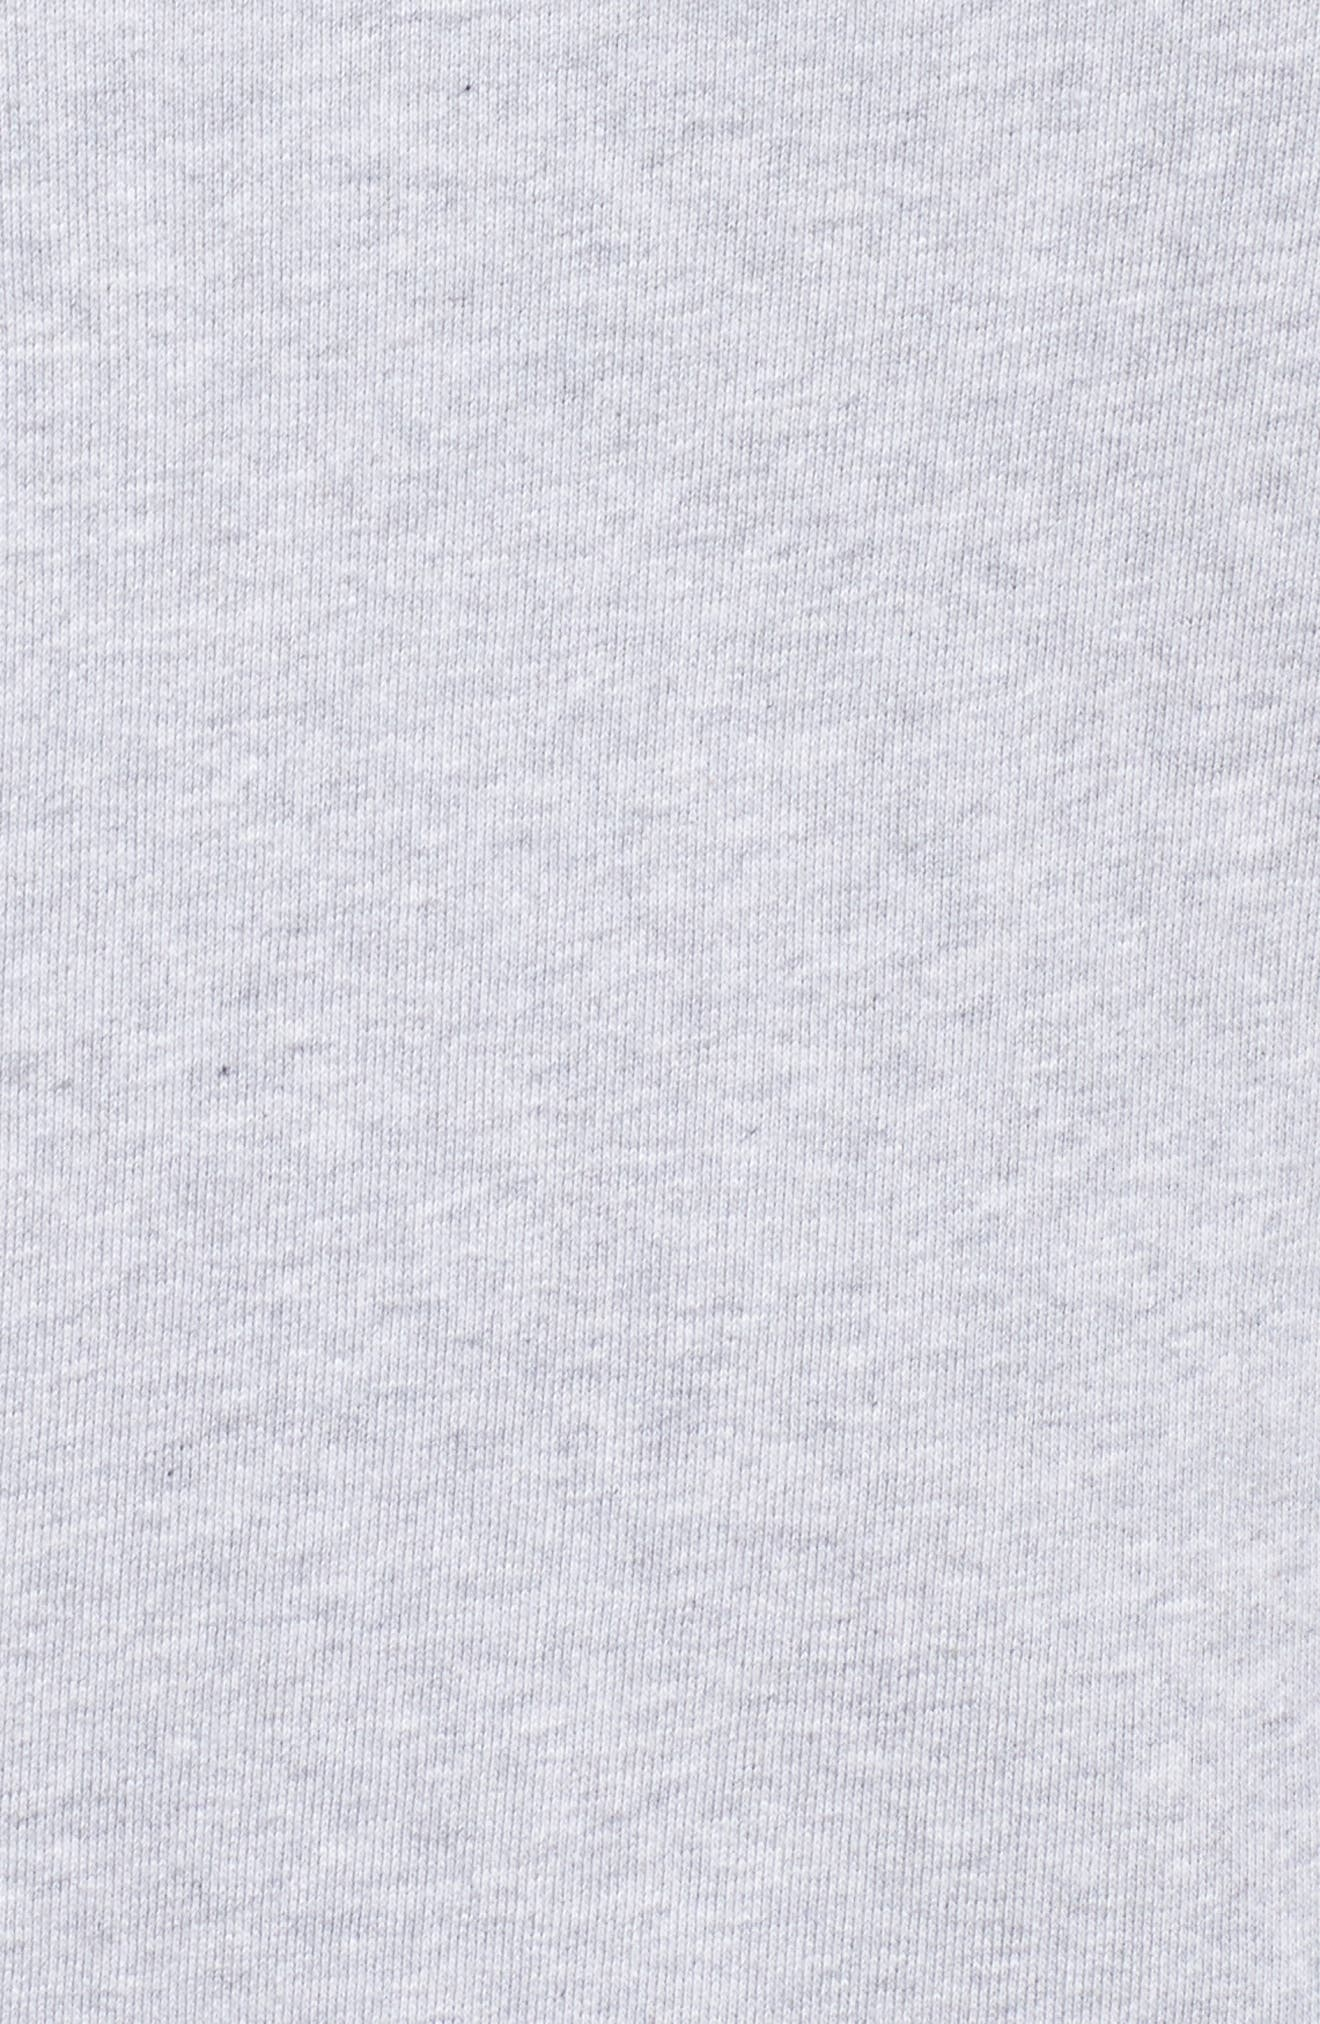 Patchwork Sweatshirt,                             Alternate thumbnail 5, color,                             Grey Floral